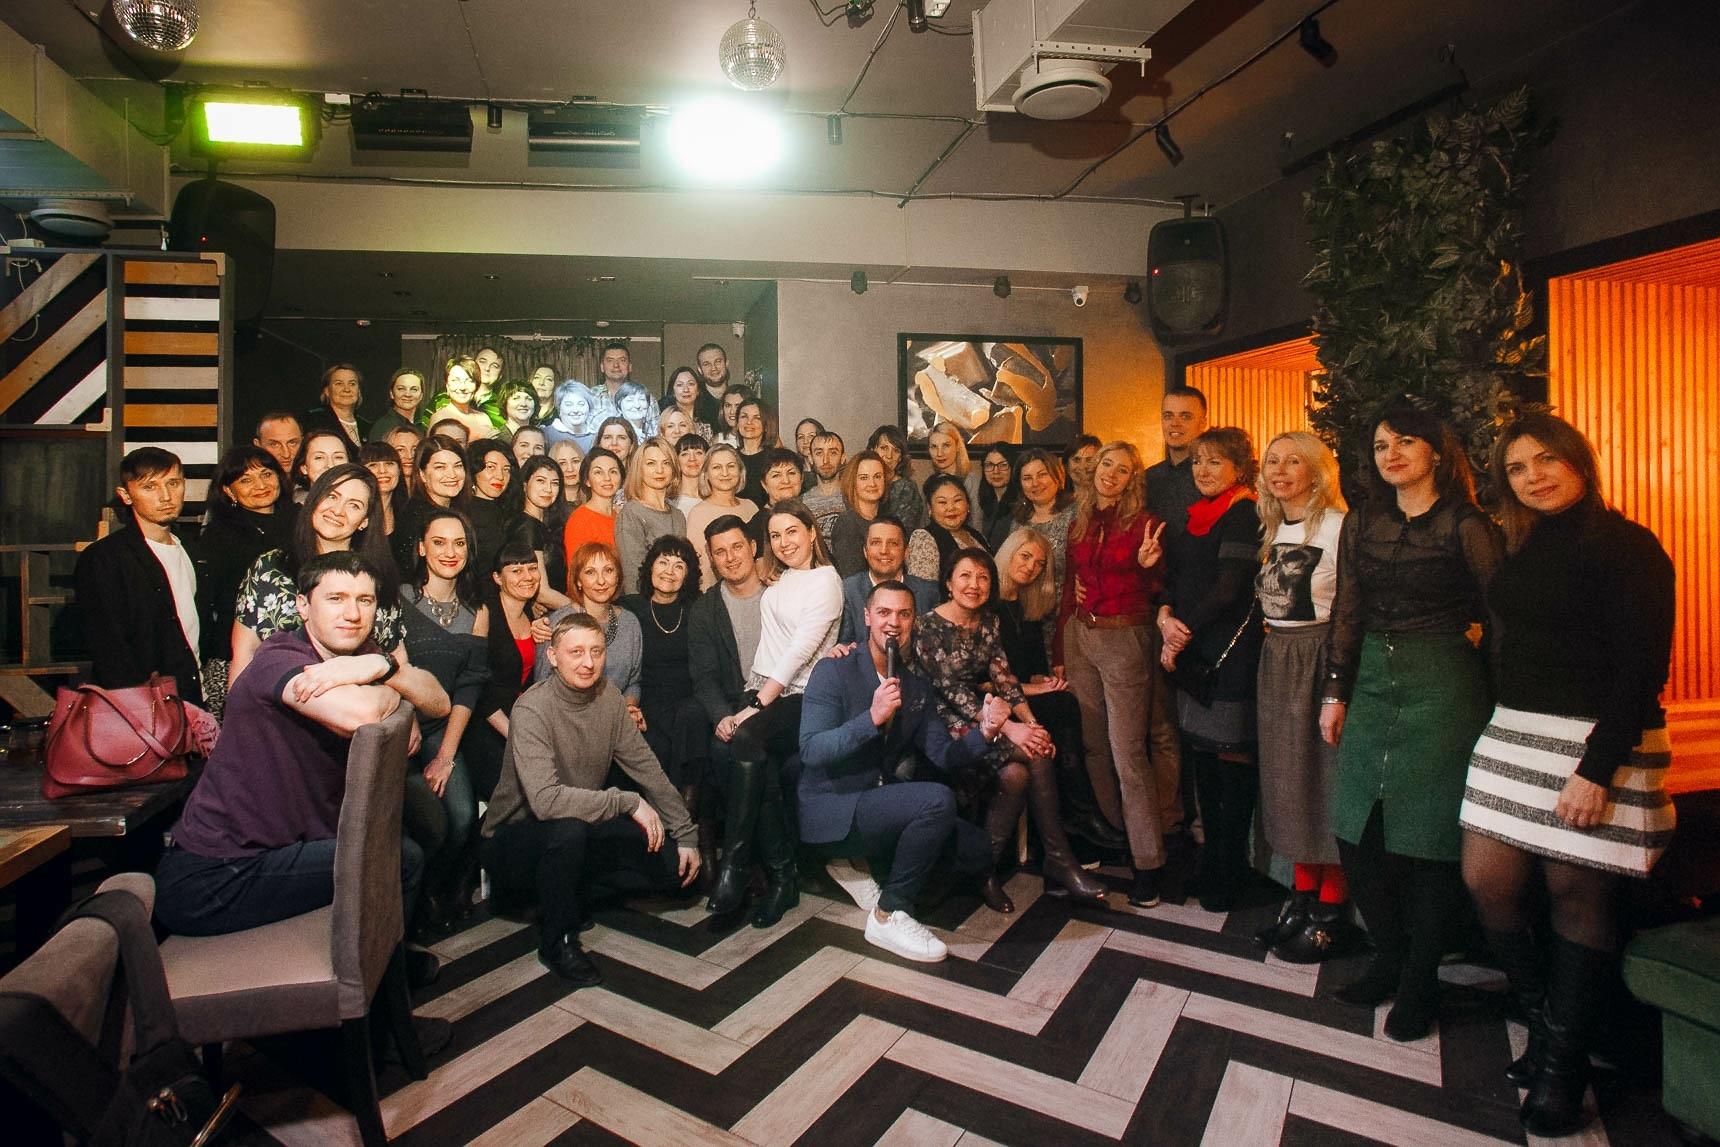 Встреча в ресторане «Бистрономика» 7 декабря 2018 г. Общее фото.